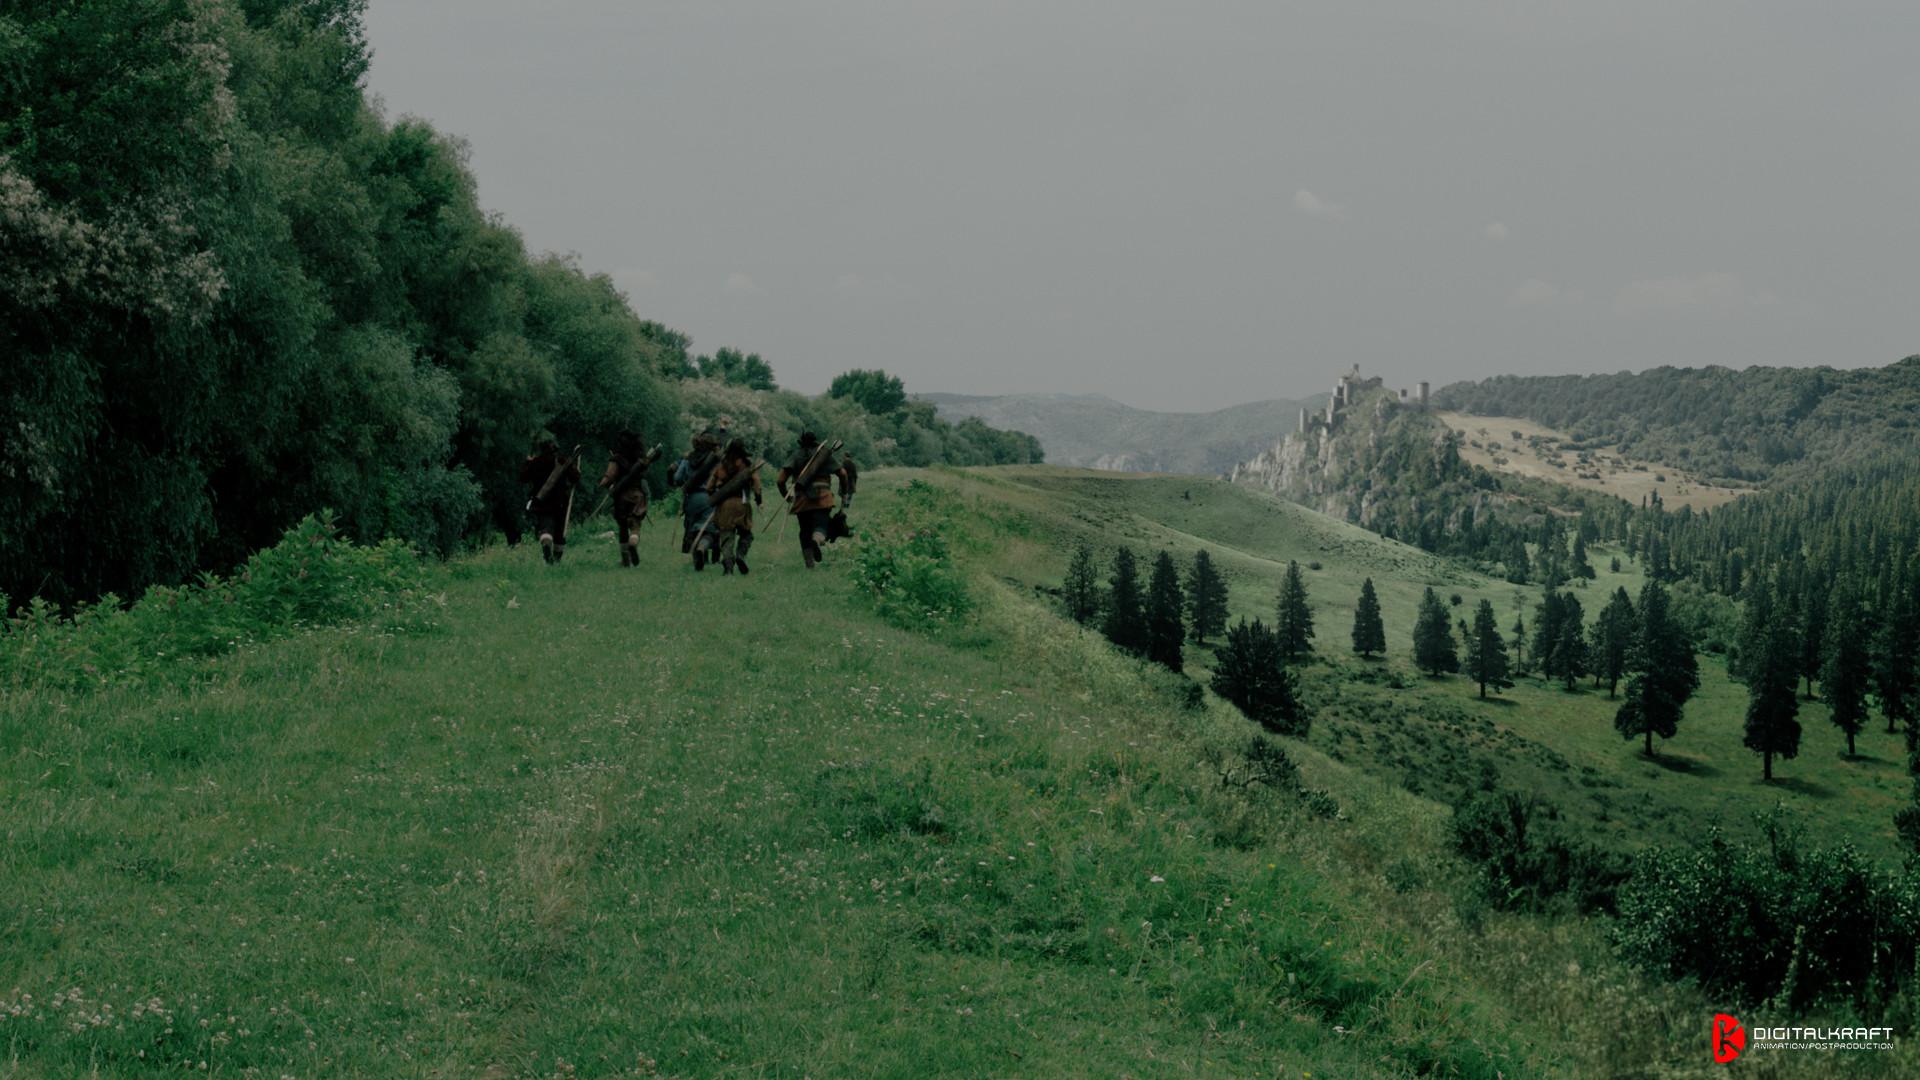 Miroslav misic e09 s06 k01 trcanje zamak 01